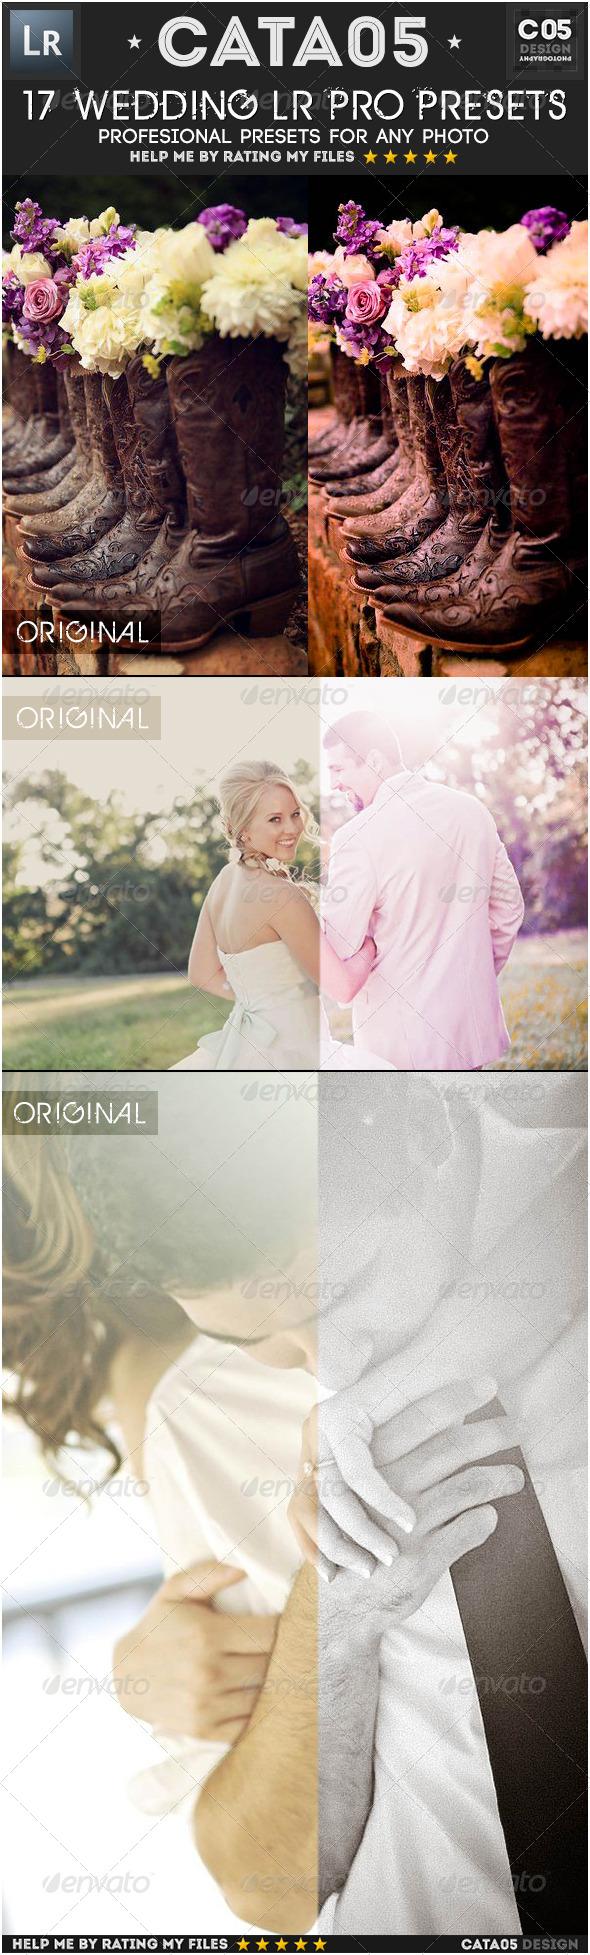 GraphicRiver 17 Wedding Pro Presets 6592601